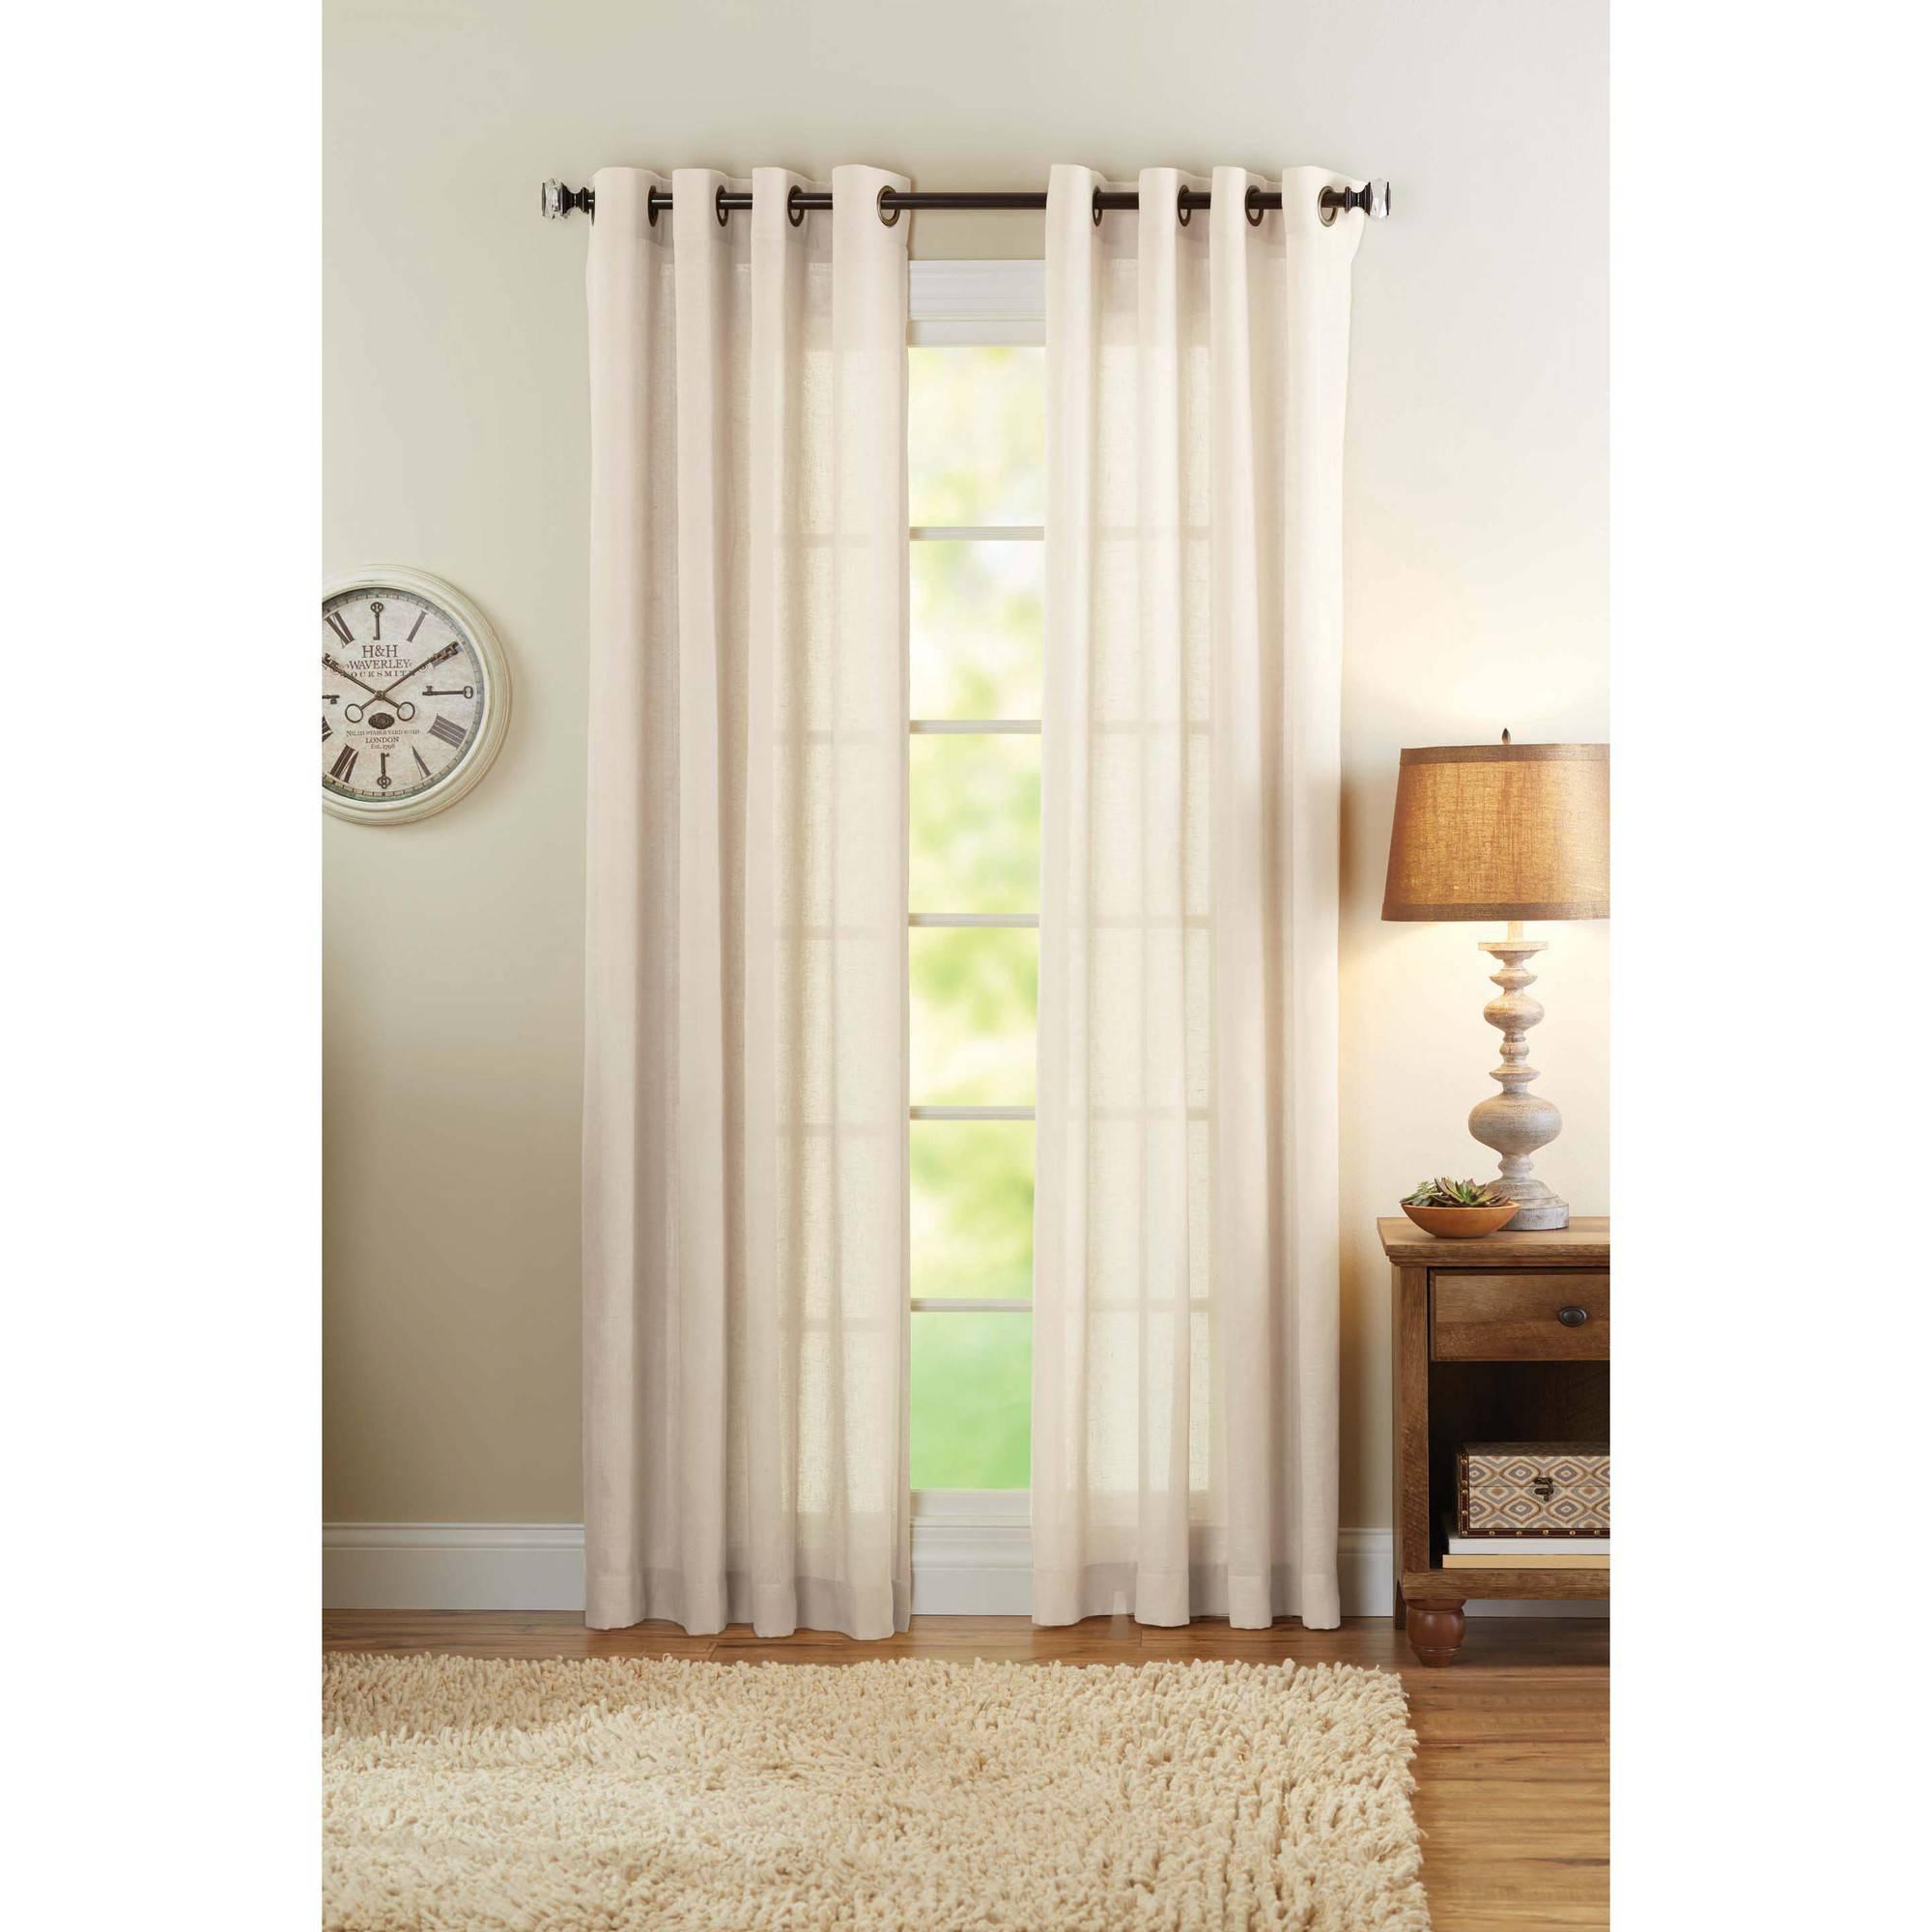 Better Homes and Gardens Semi-Sheer Grommet Curtain Panel, Bleached Linen